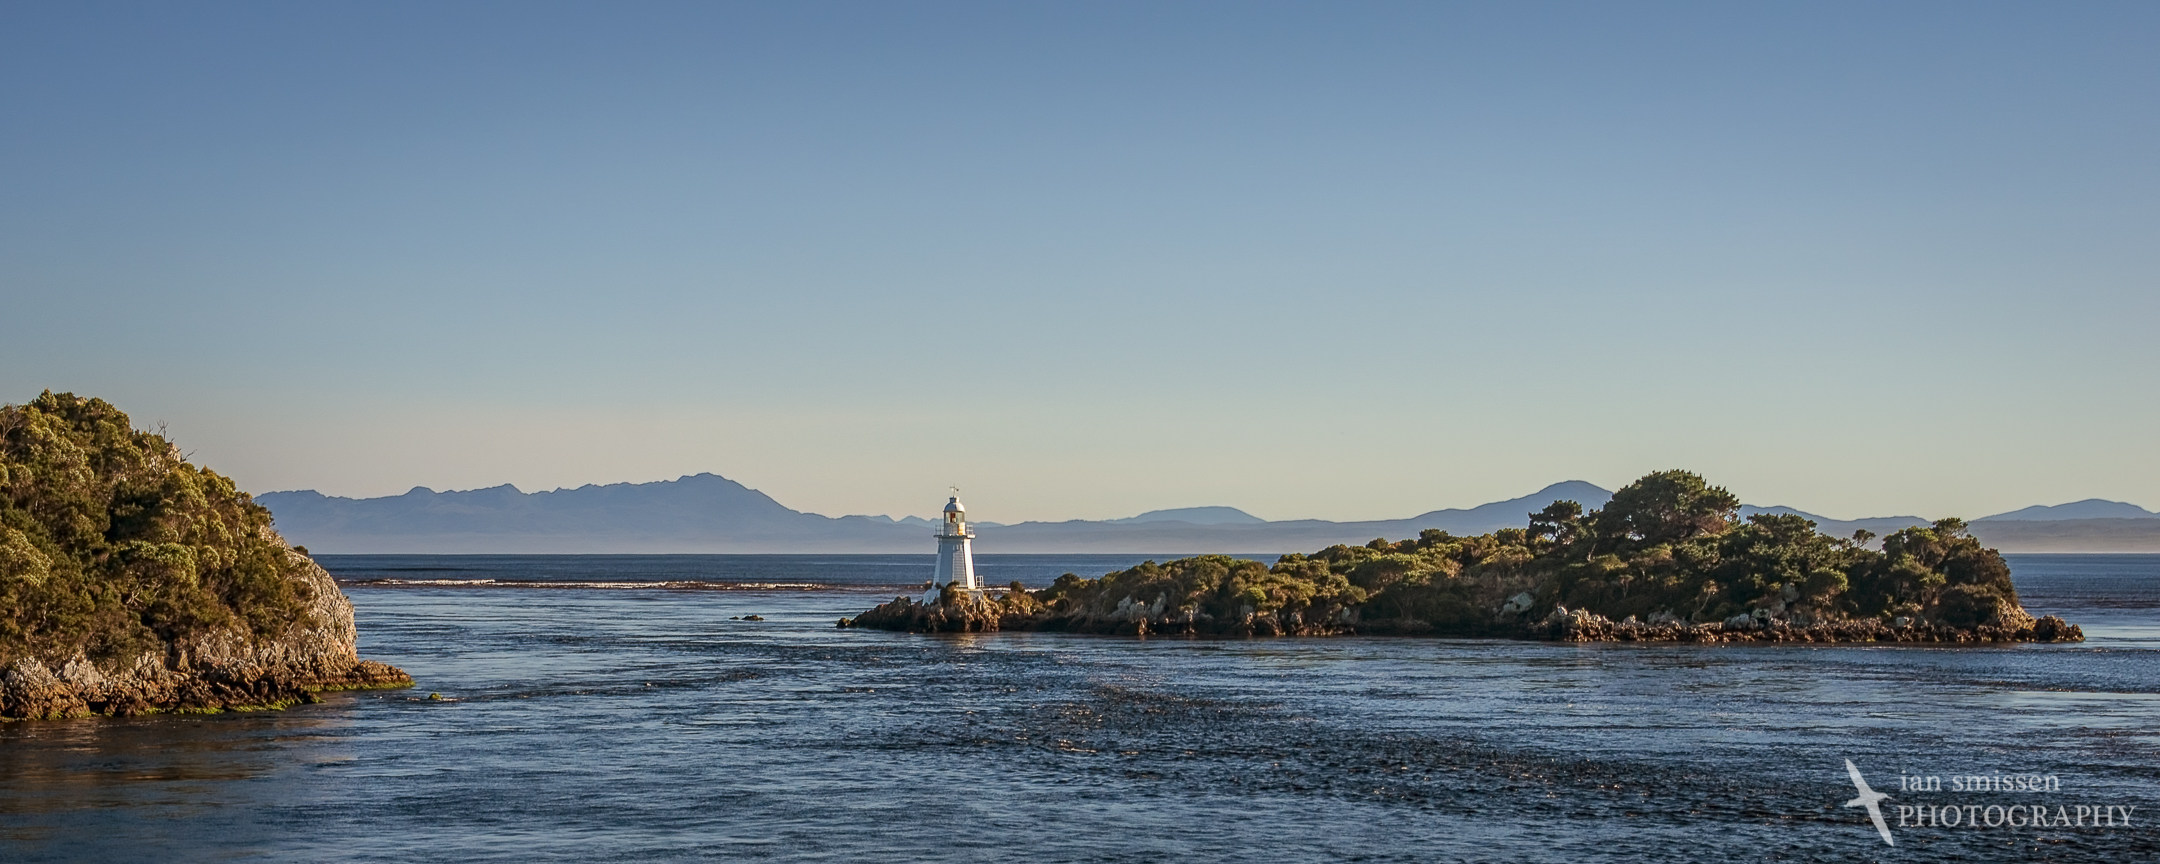 The Entrance Island Lighthouse